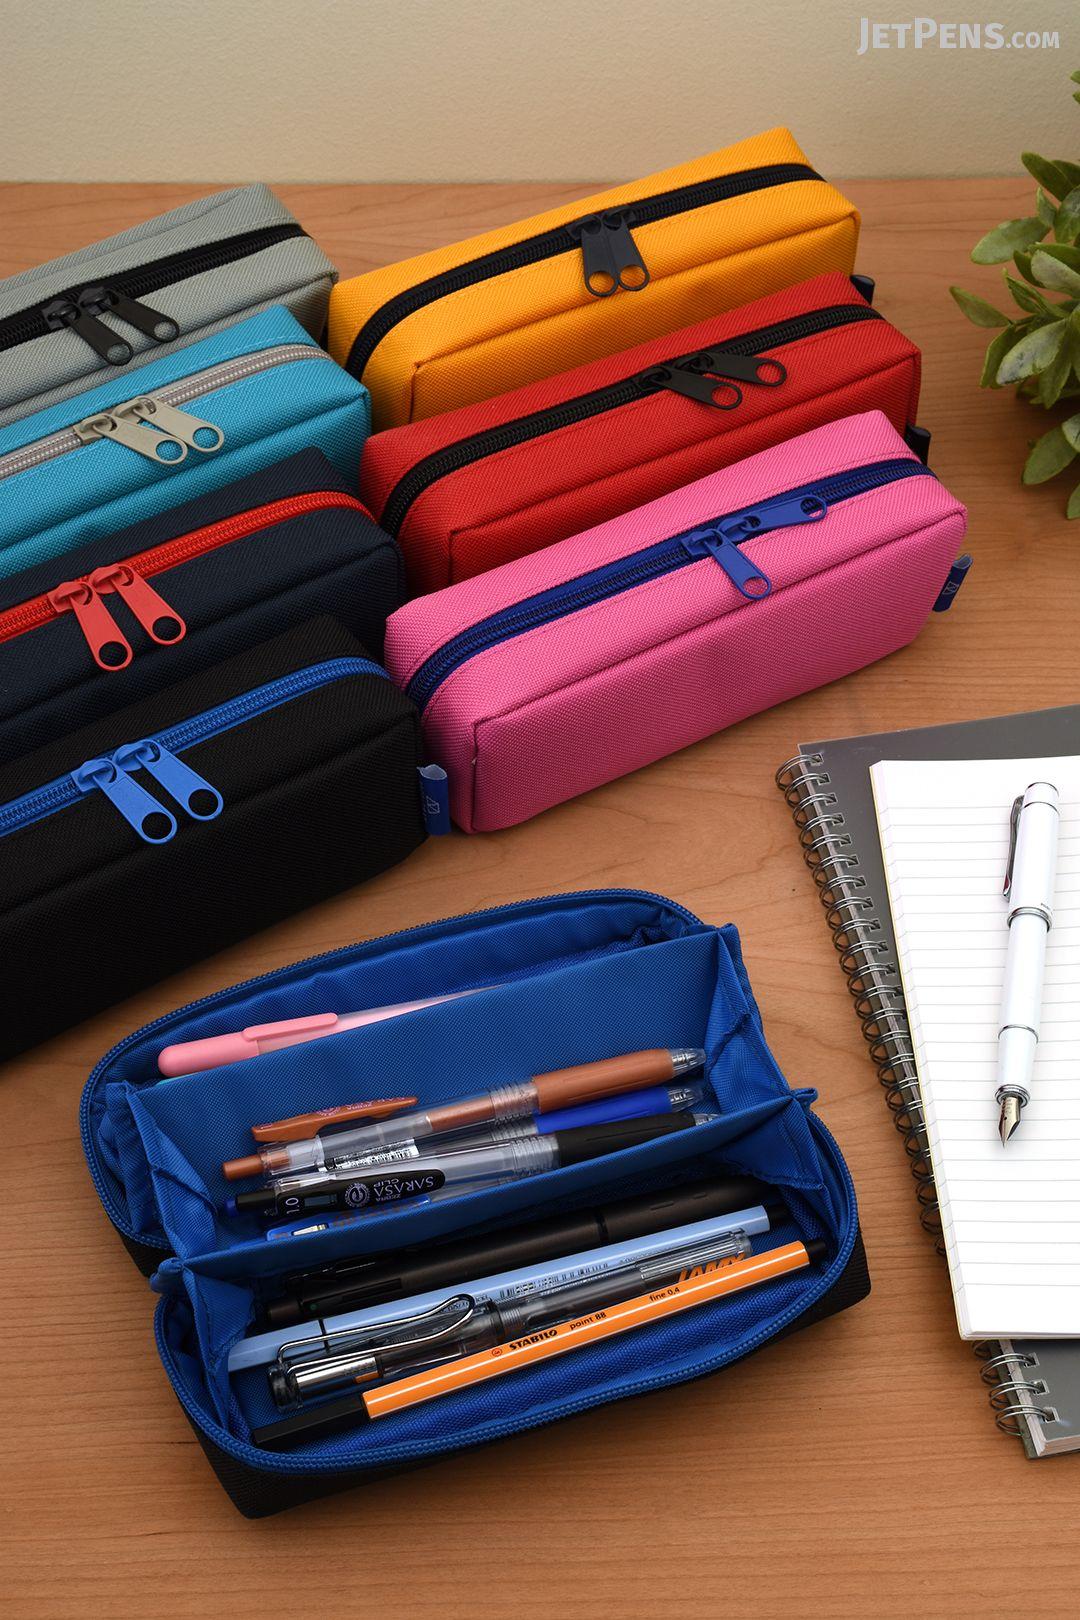 e78e5e225c74 Kamio Japan Paco-Tray Pen Cases open wide to display three tray ...